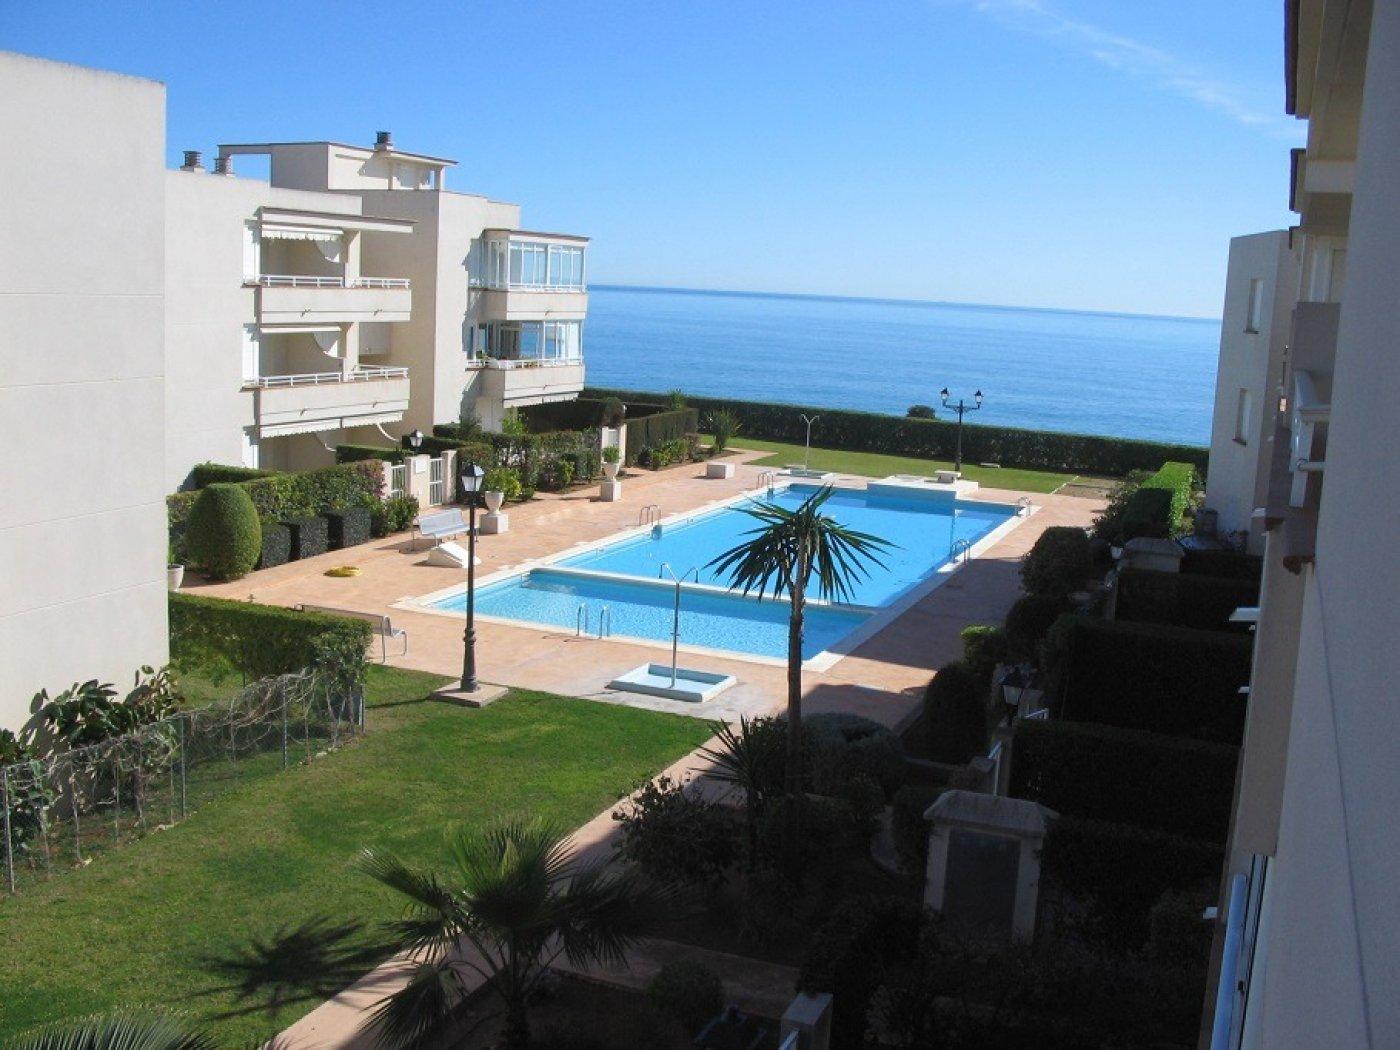 Apartment for rent in Zona Norte, Vinaros